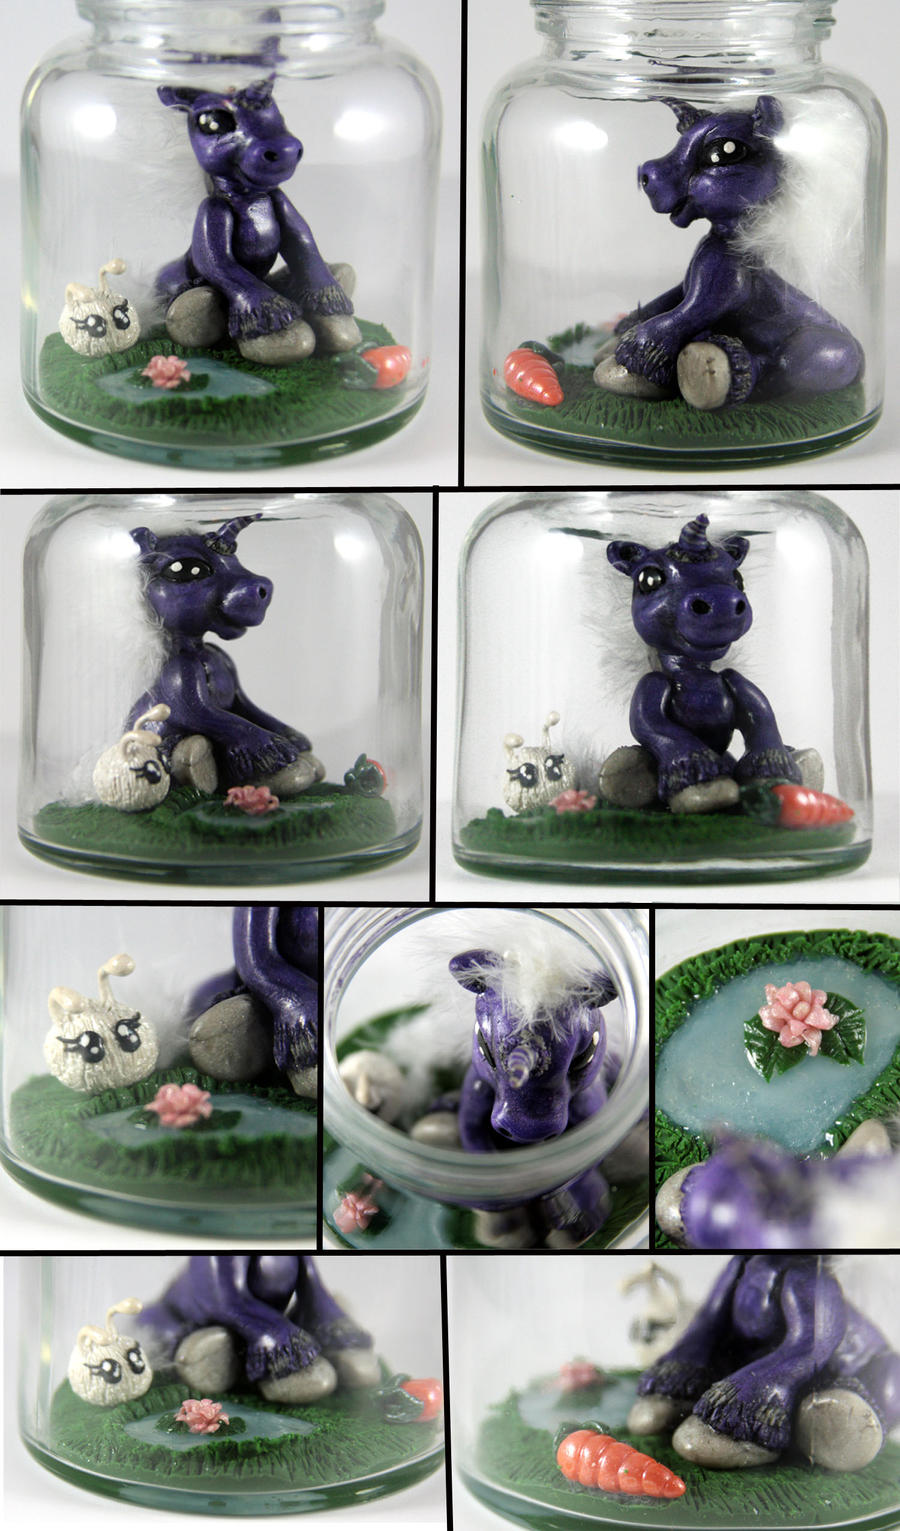 My Pet Unicorn WIP by NeverlandJewelry